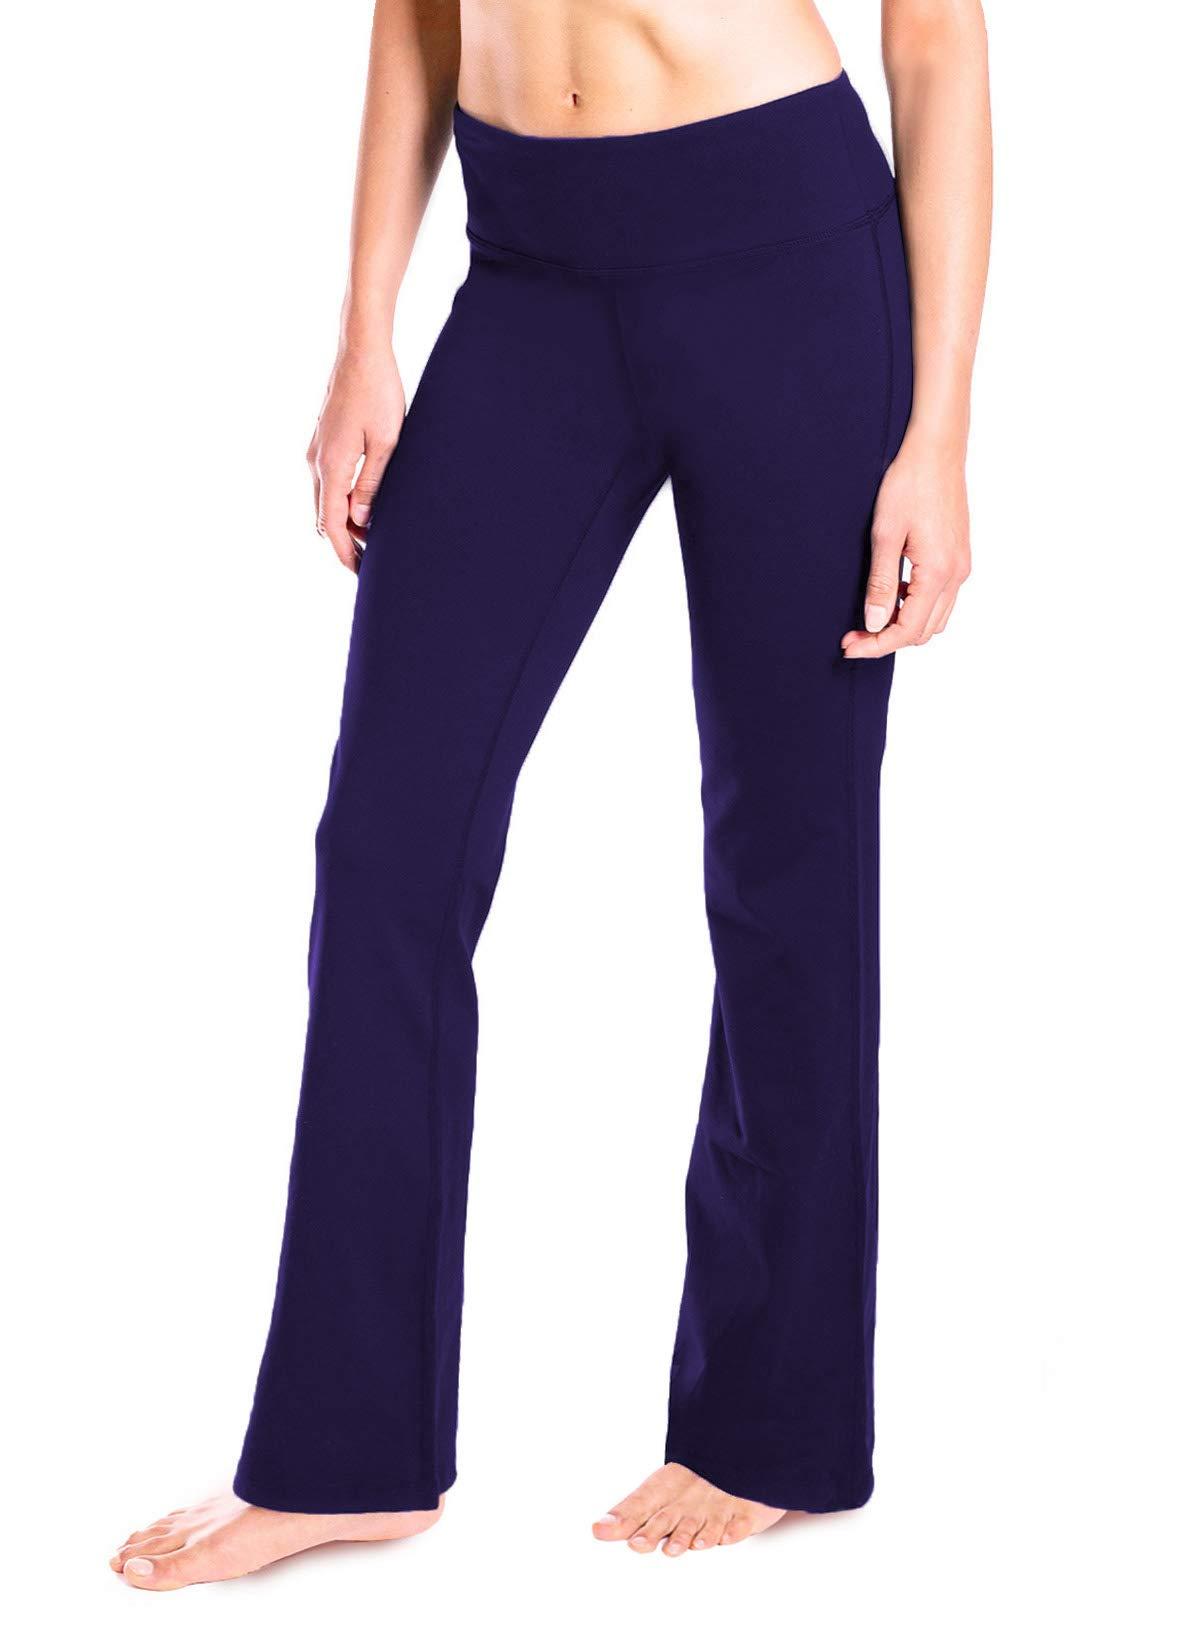 "Yogipace 27""/28""/29""/30""/31""/32""/33""/35""/37"" Inseam,Petite/Regular/Tall, Women's Bootcut Yoga Pants Long Workout Pants"